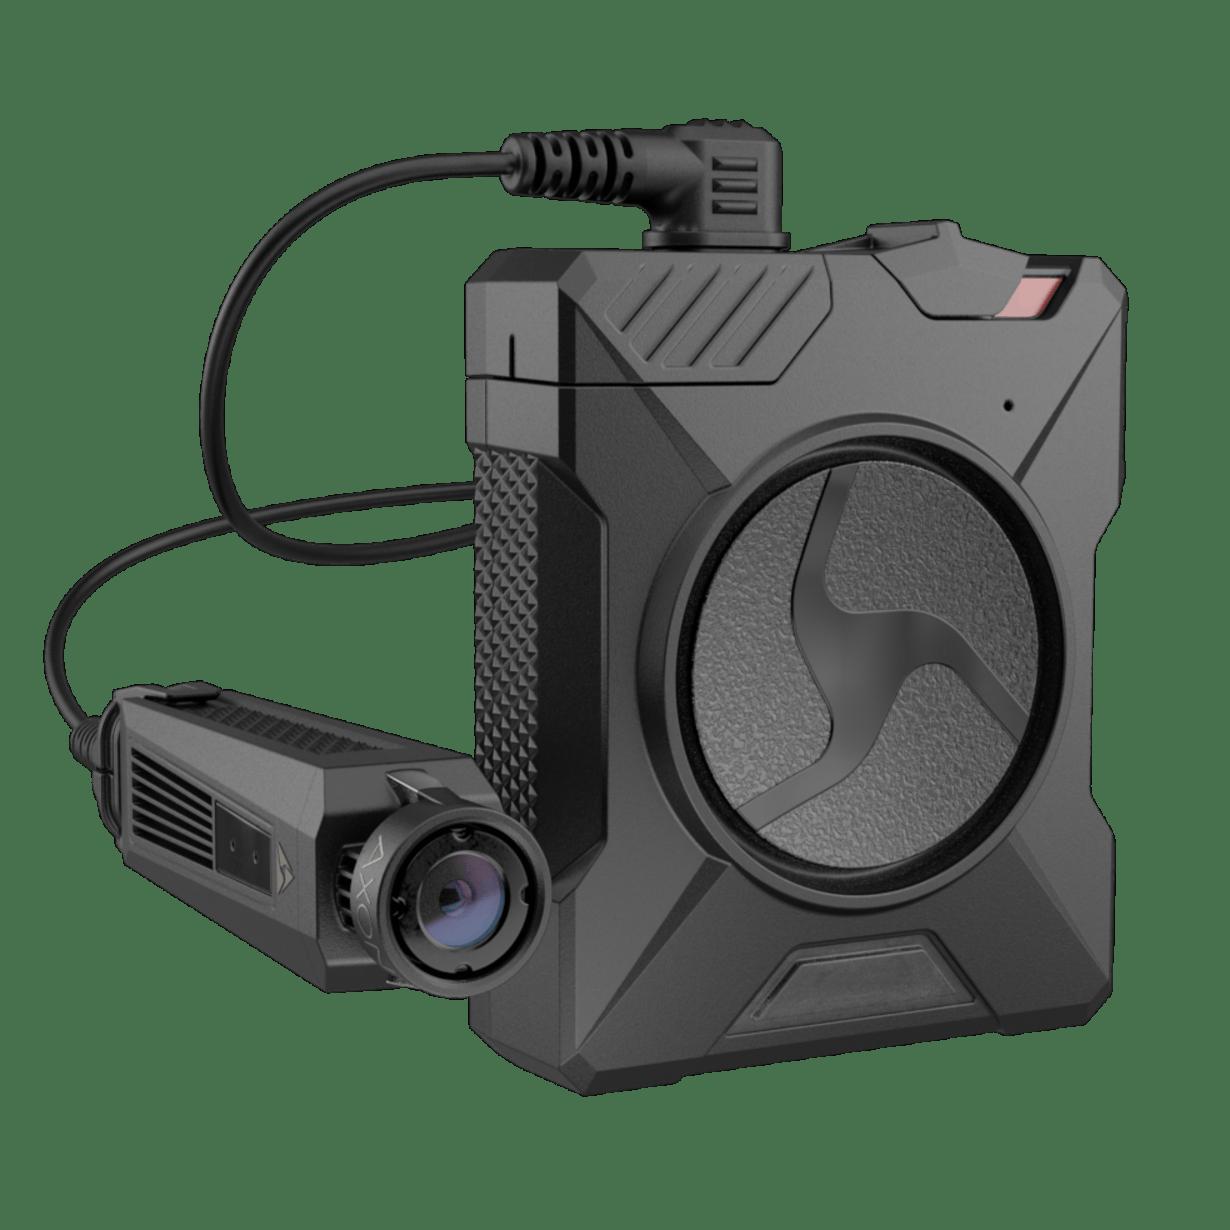 Axon Flex Camera with Epaulette Mount